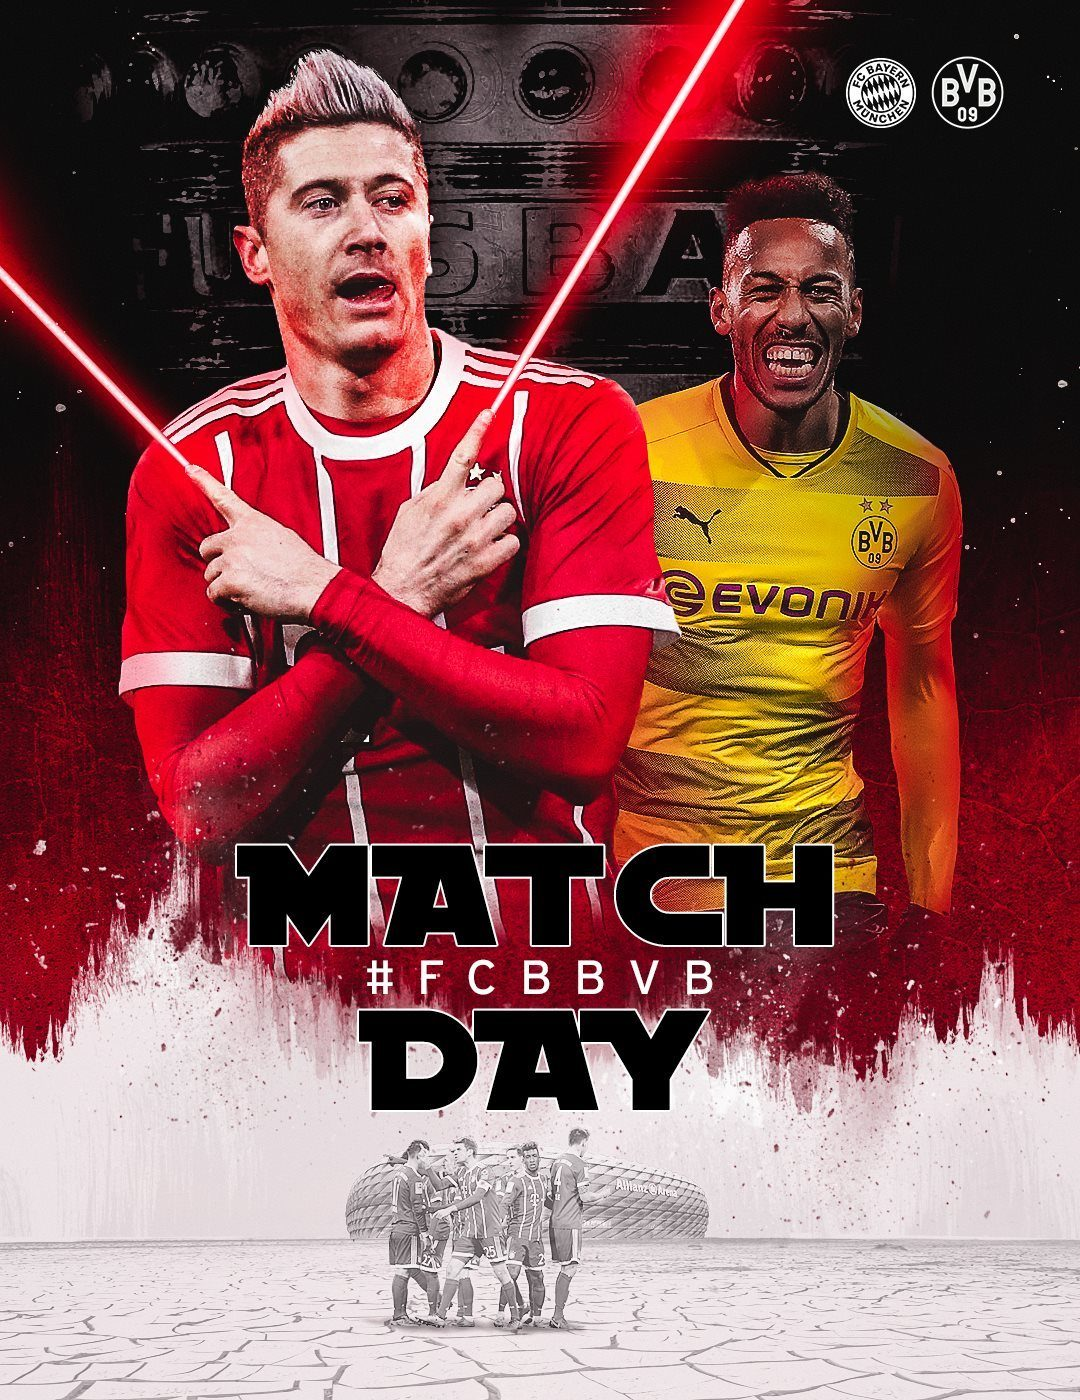 fotó: FC Bayern Facebook